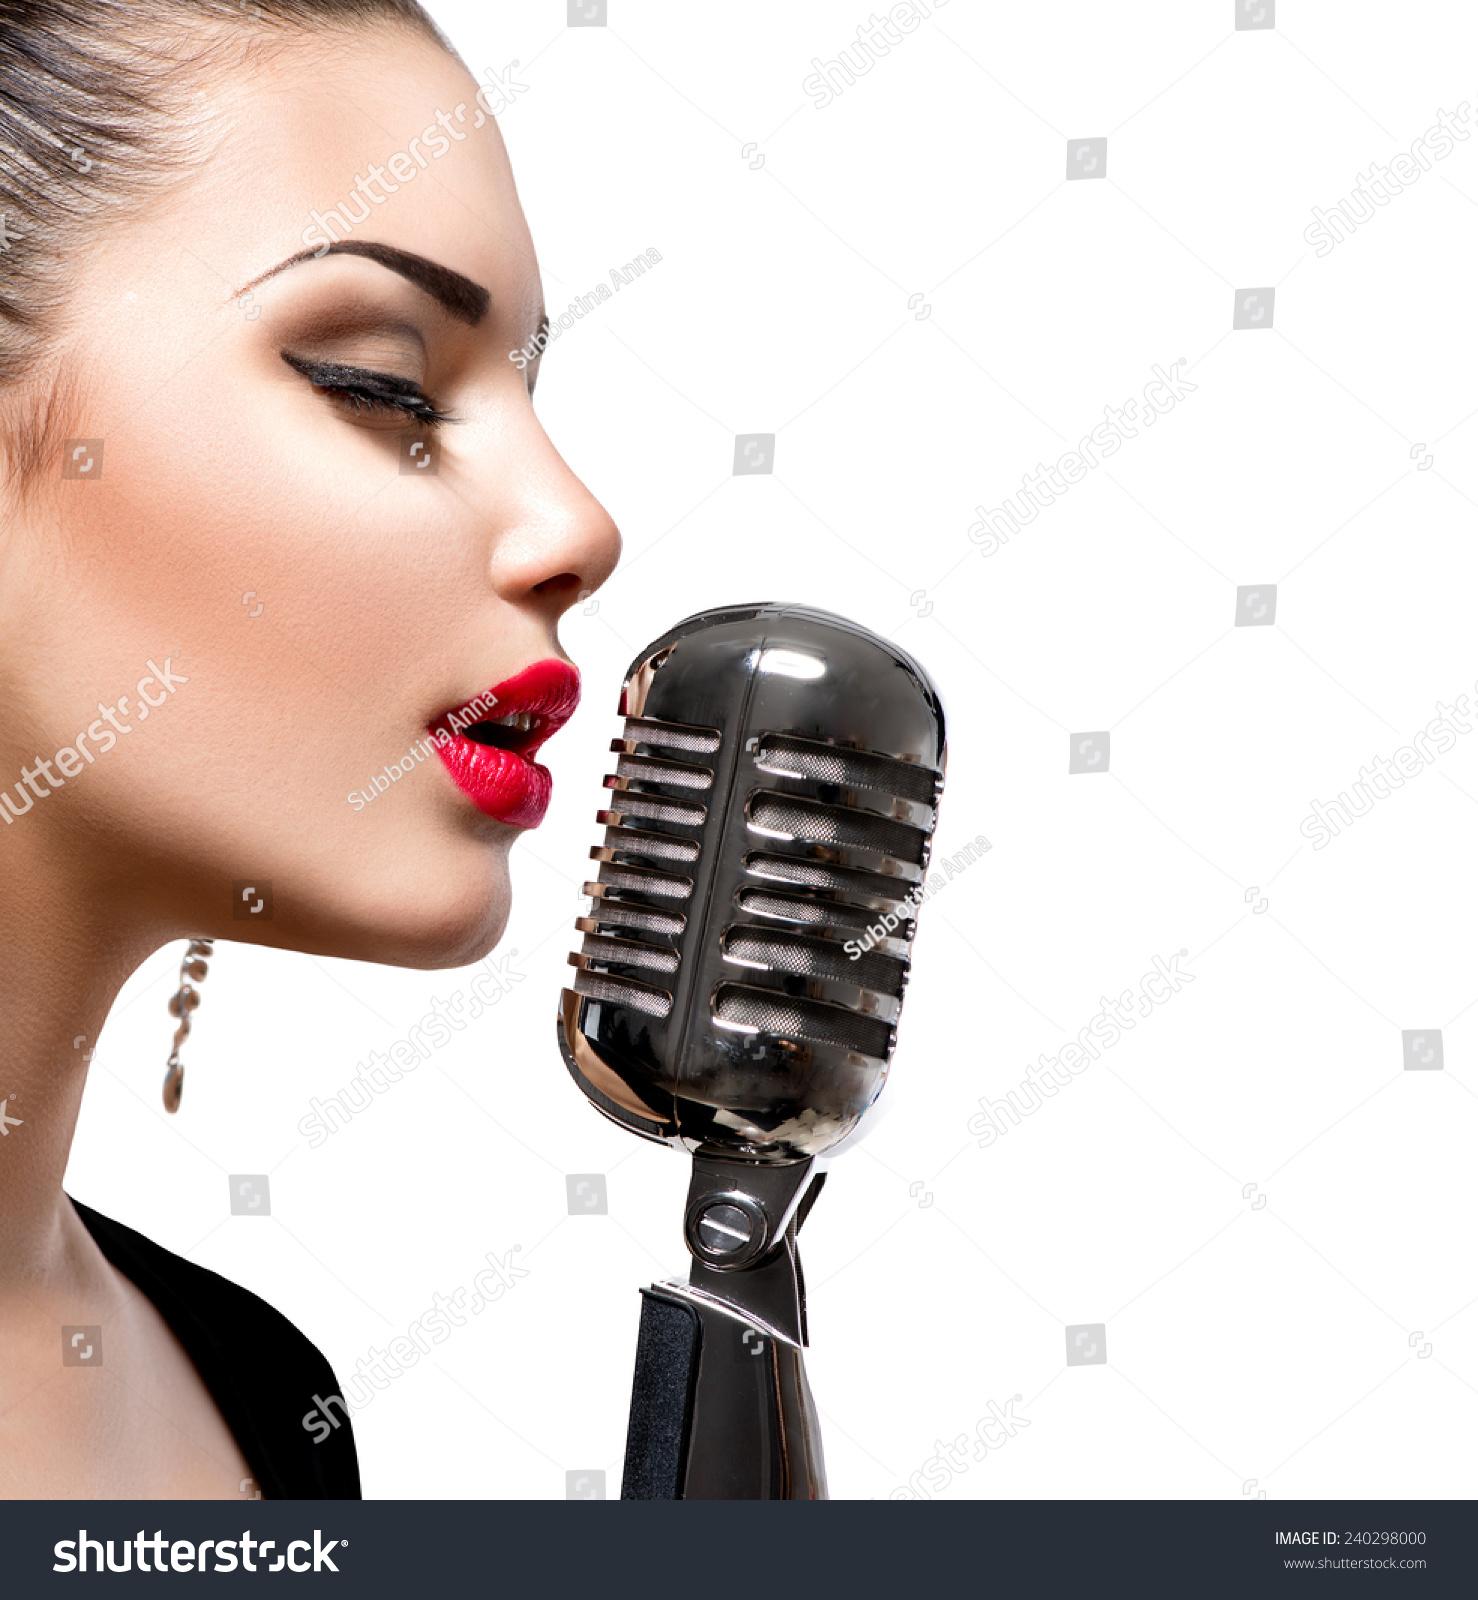 singing the girl retro - photo #6